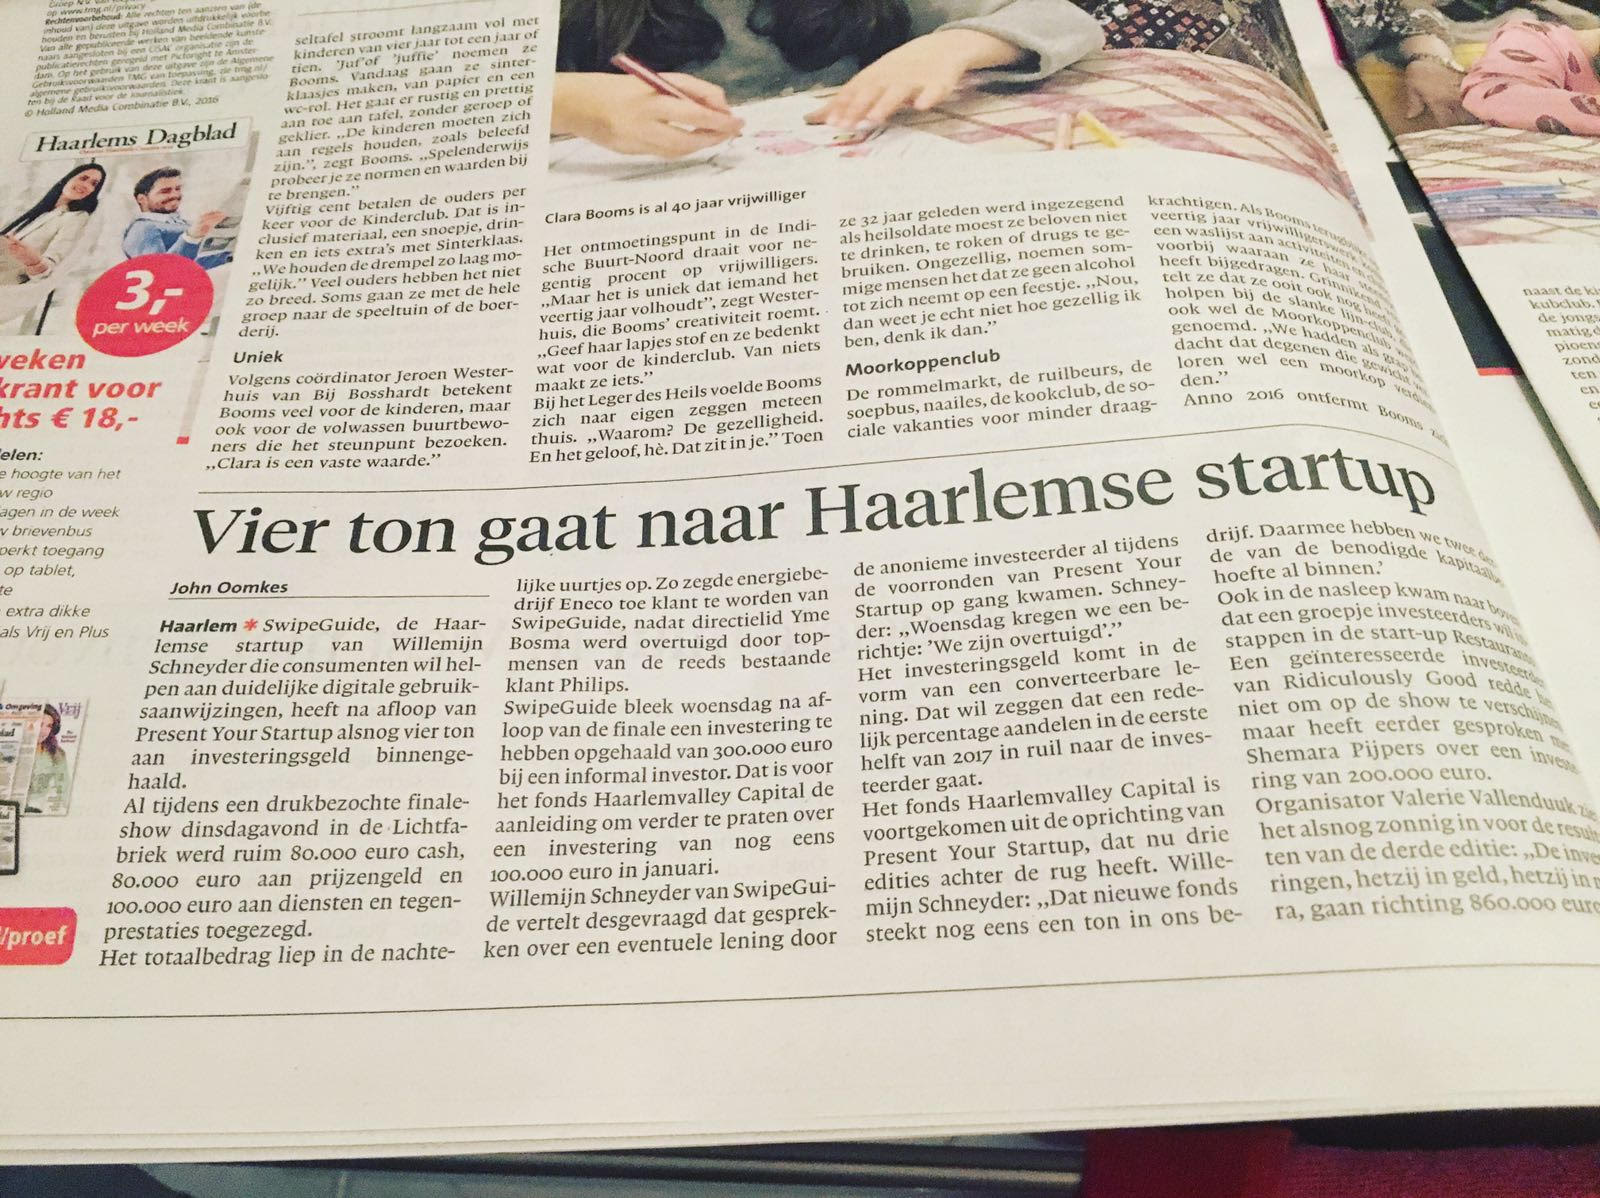 Haarlems Dagblad 25/11/16